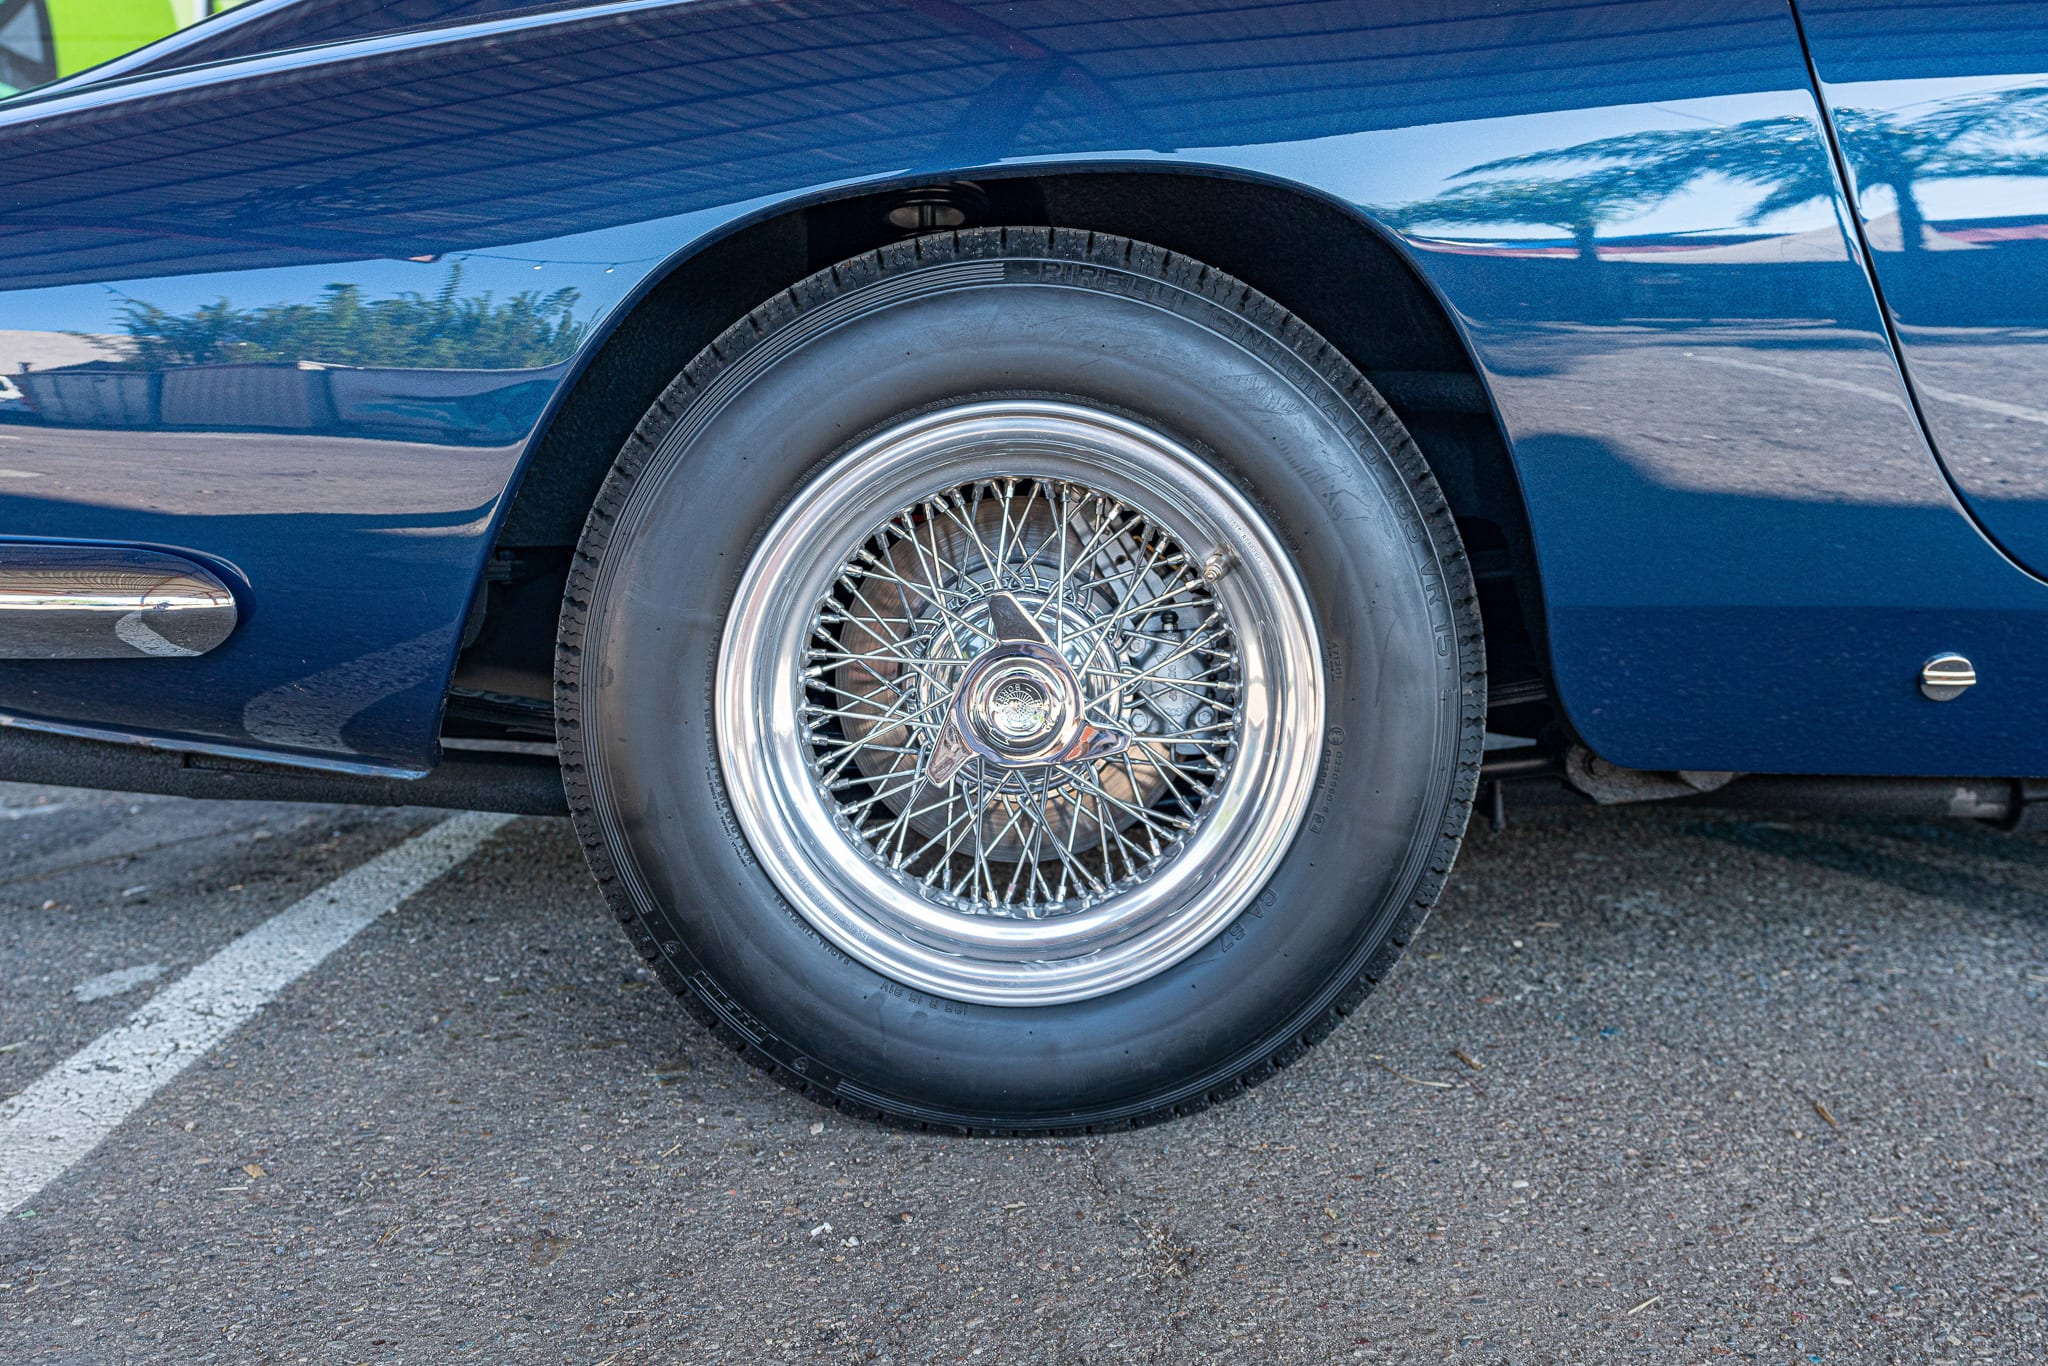 1963 Ferrari 250 GT Lusso #4481